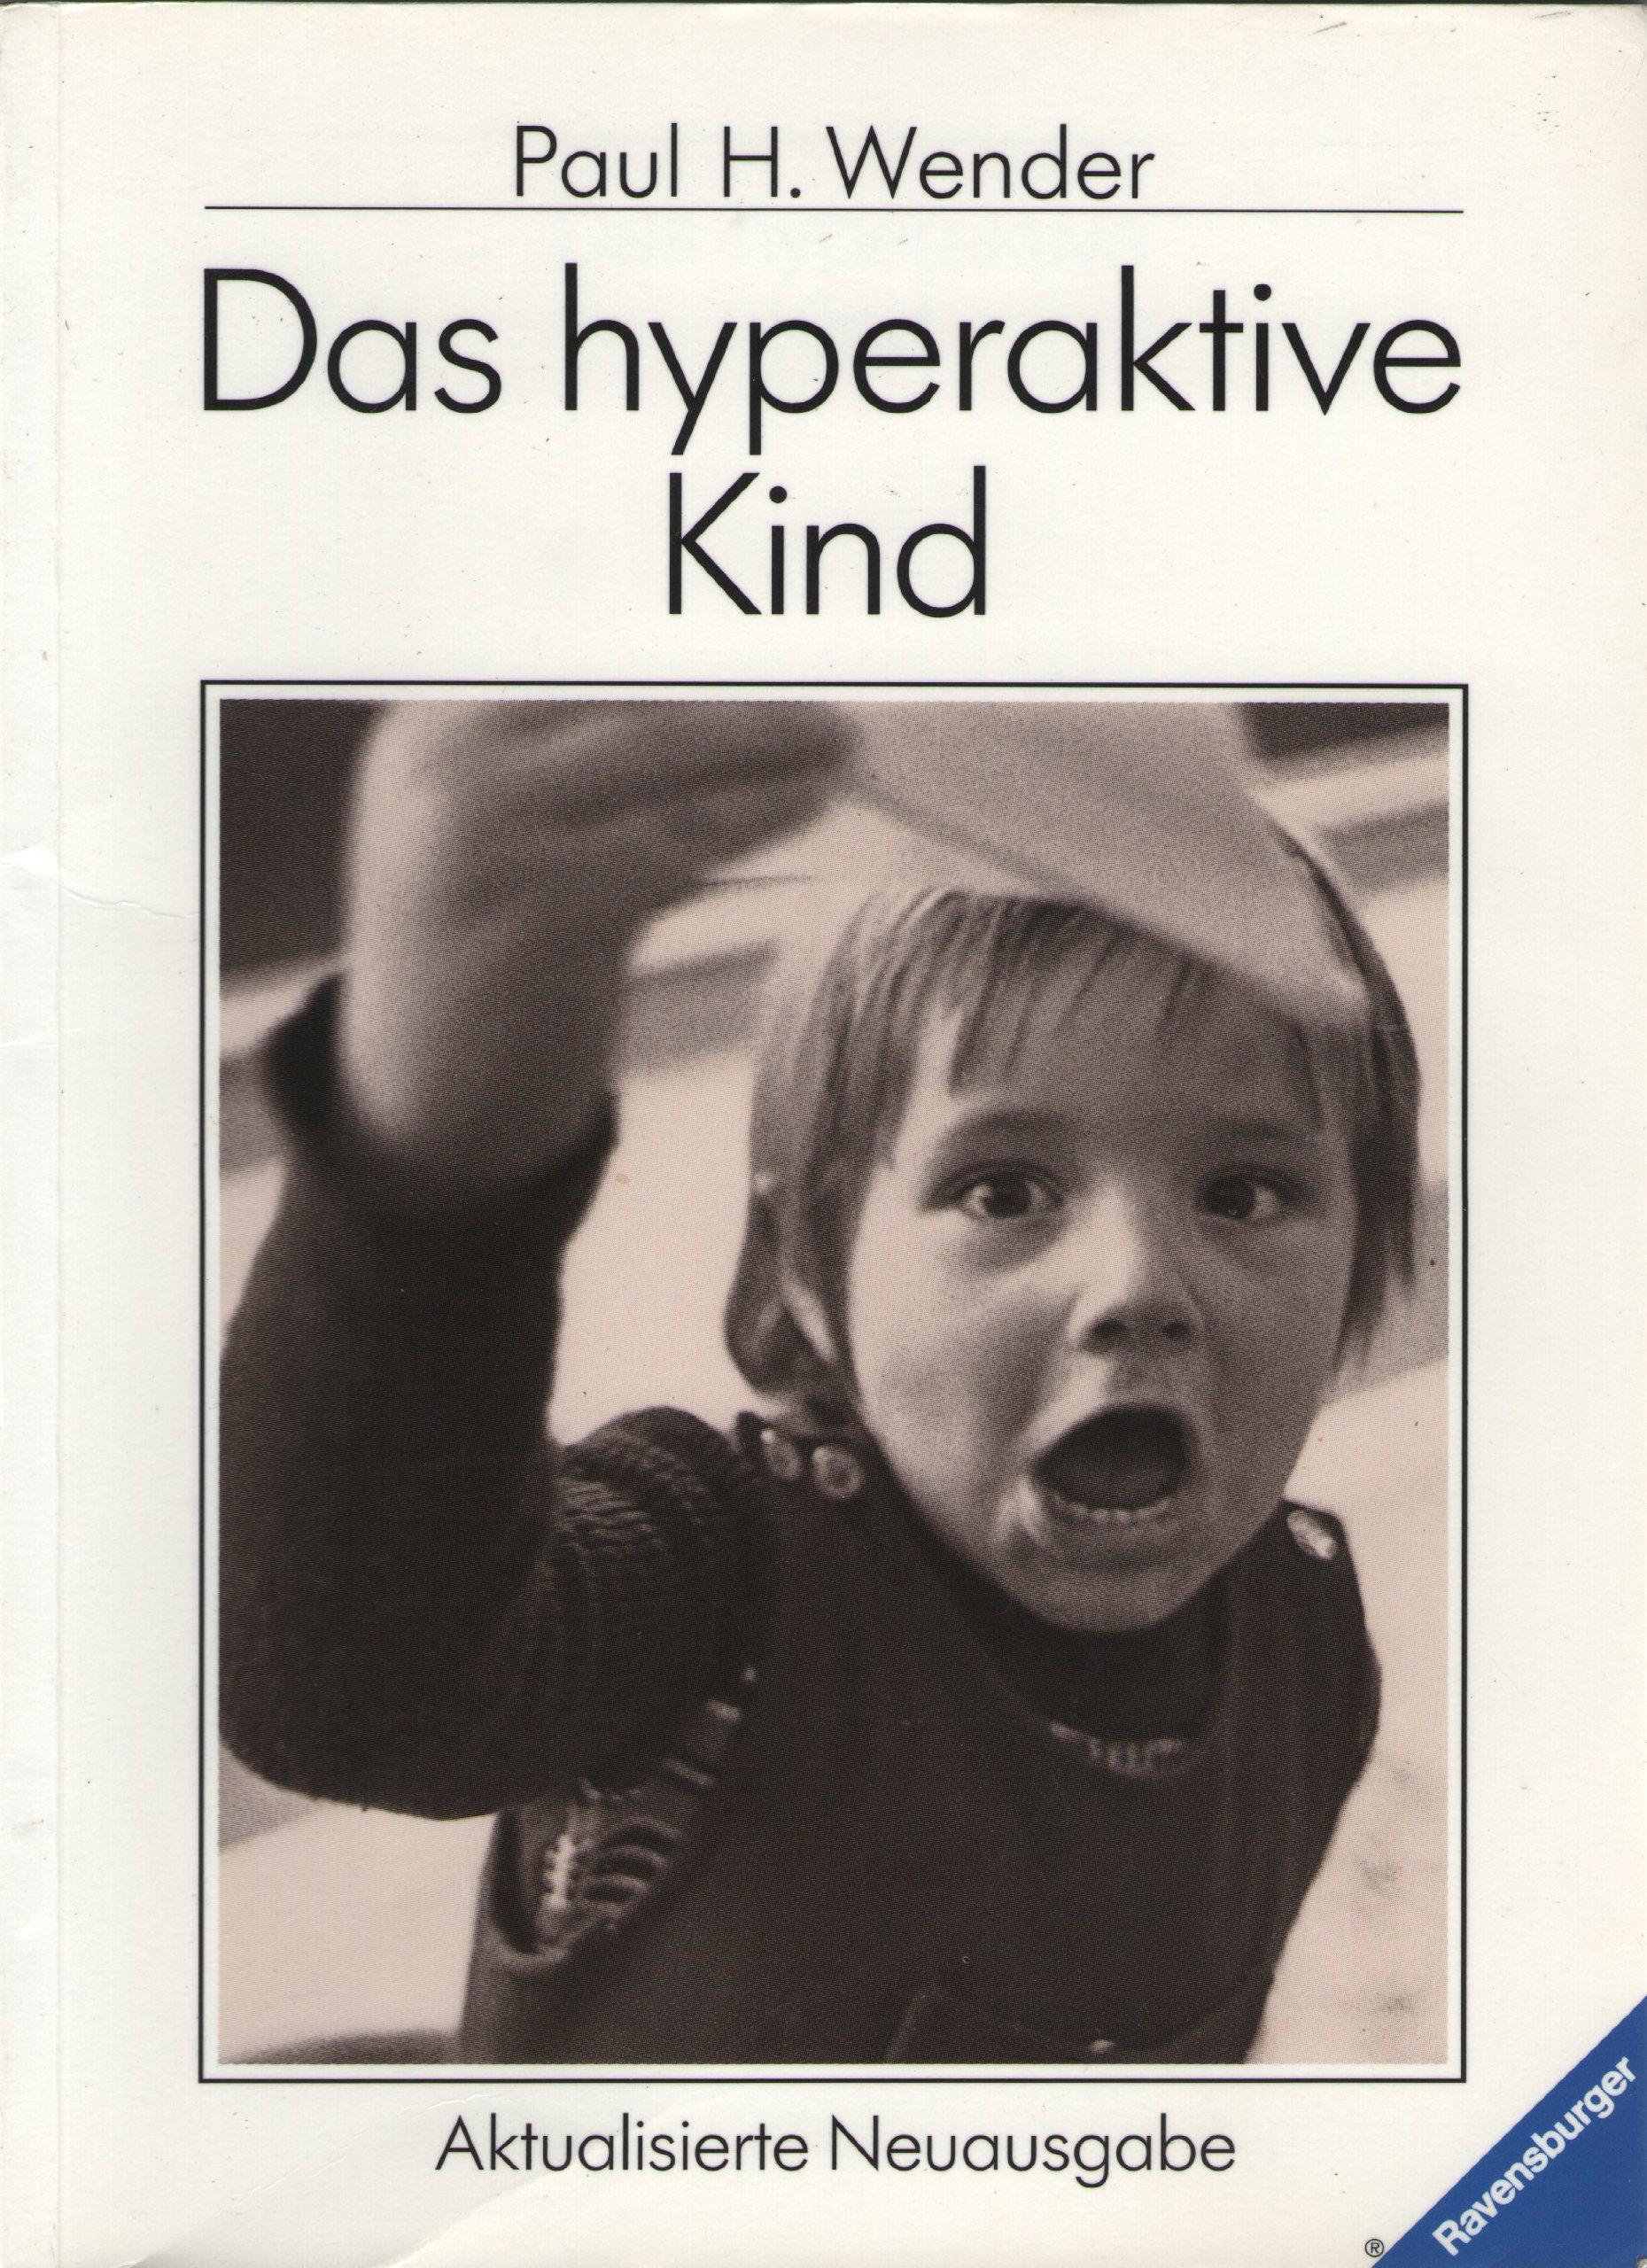 Das hyperaktive Kind